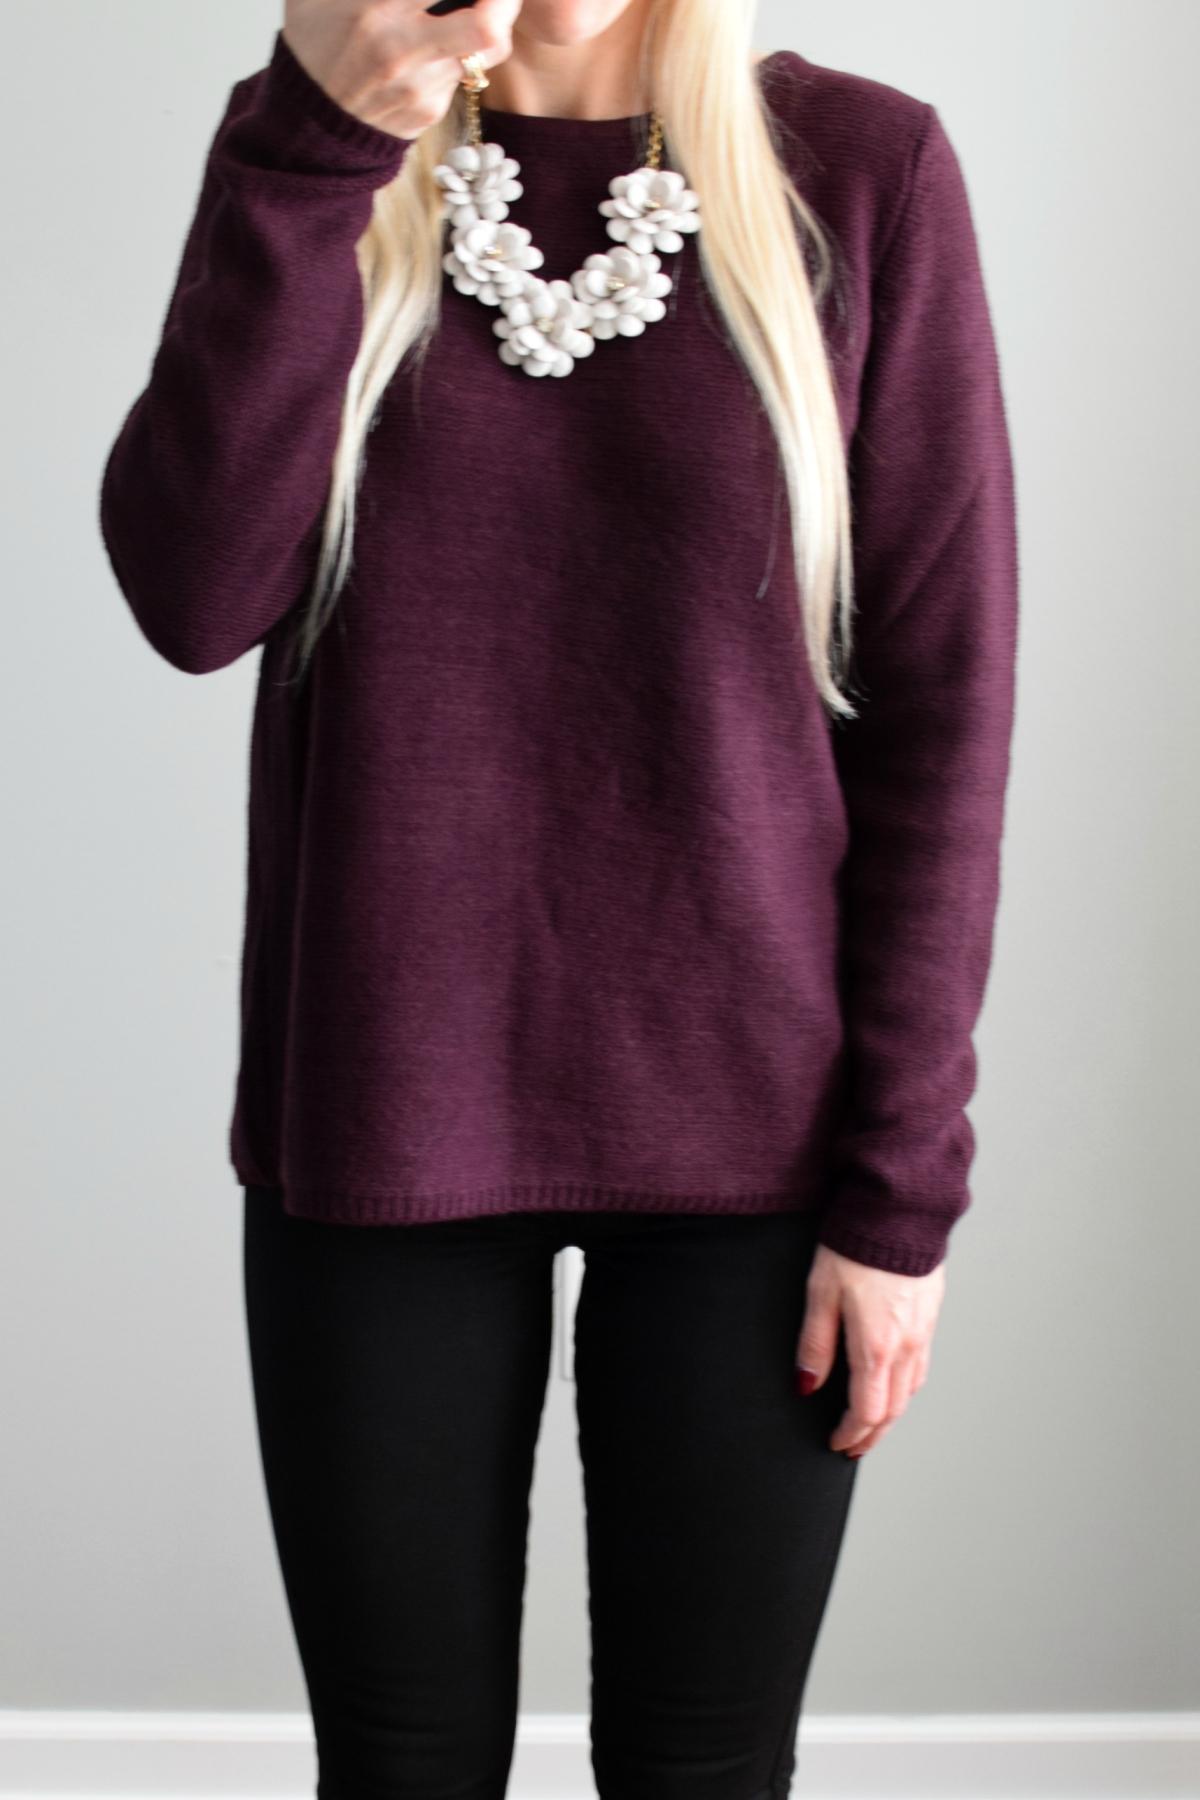 November 2016 Stitch Fix Review: Market & Spruce Brookline Mix Material Sweater |www.pearlsandsportsbras.com|